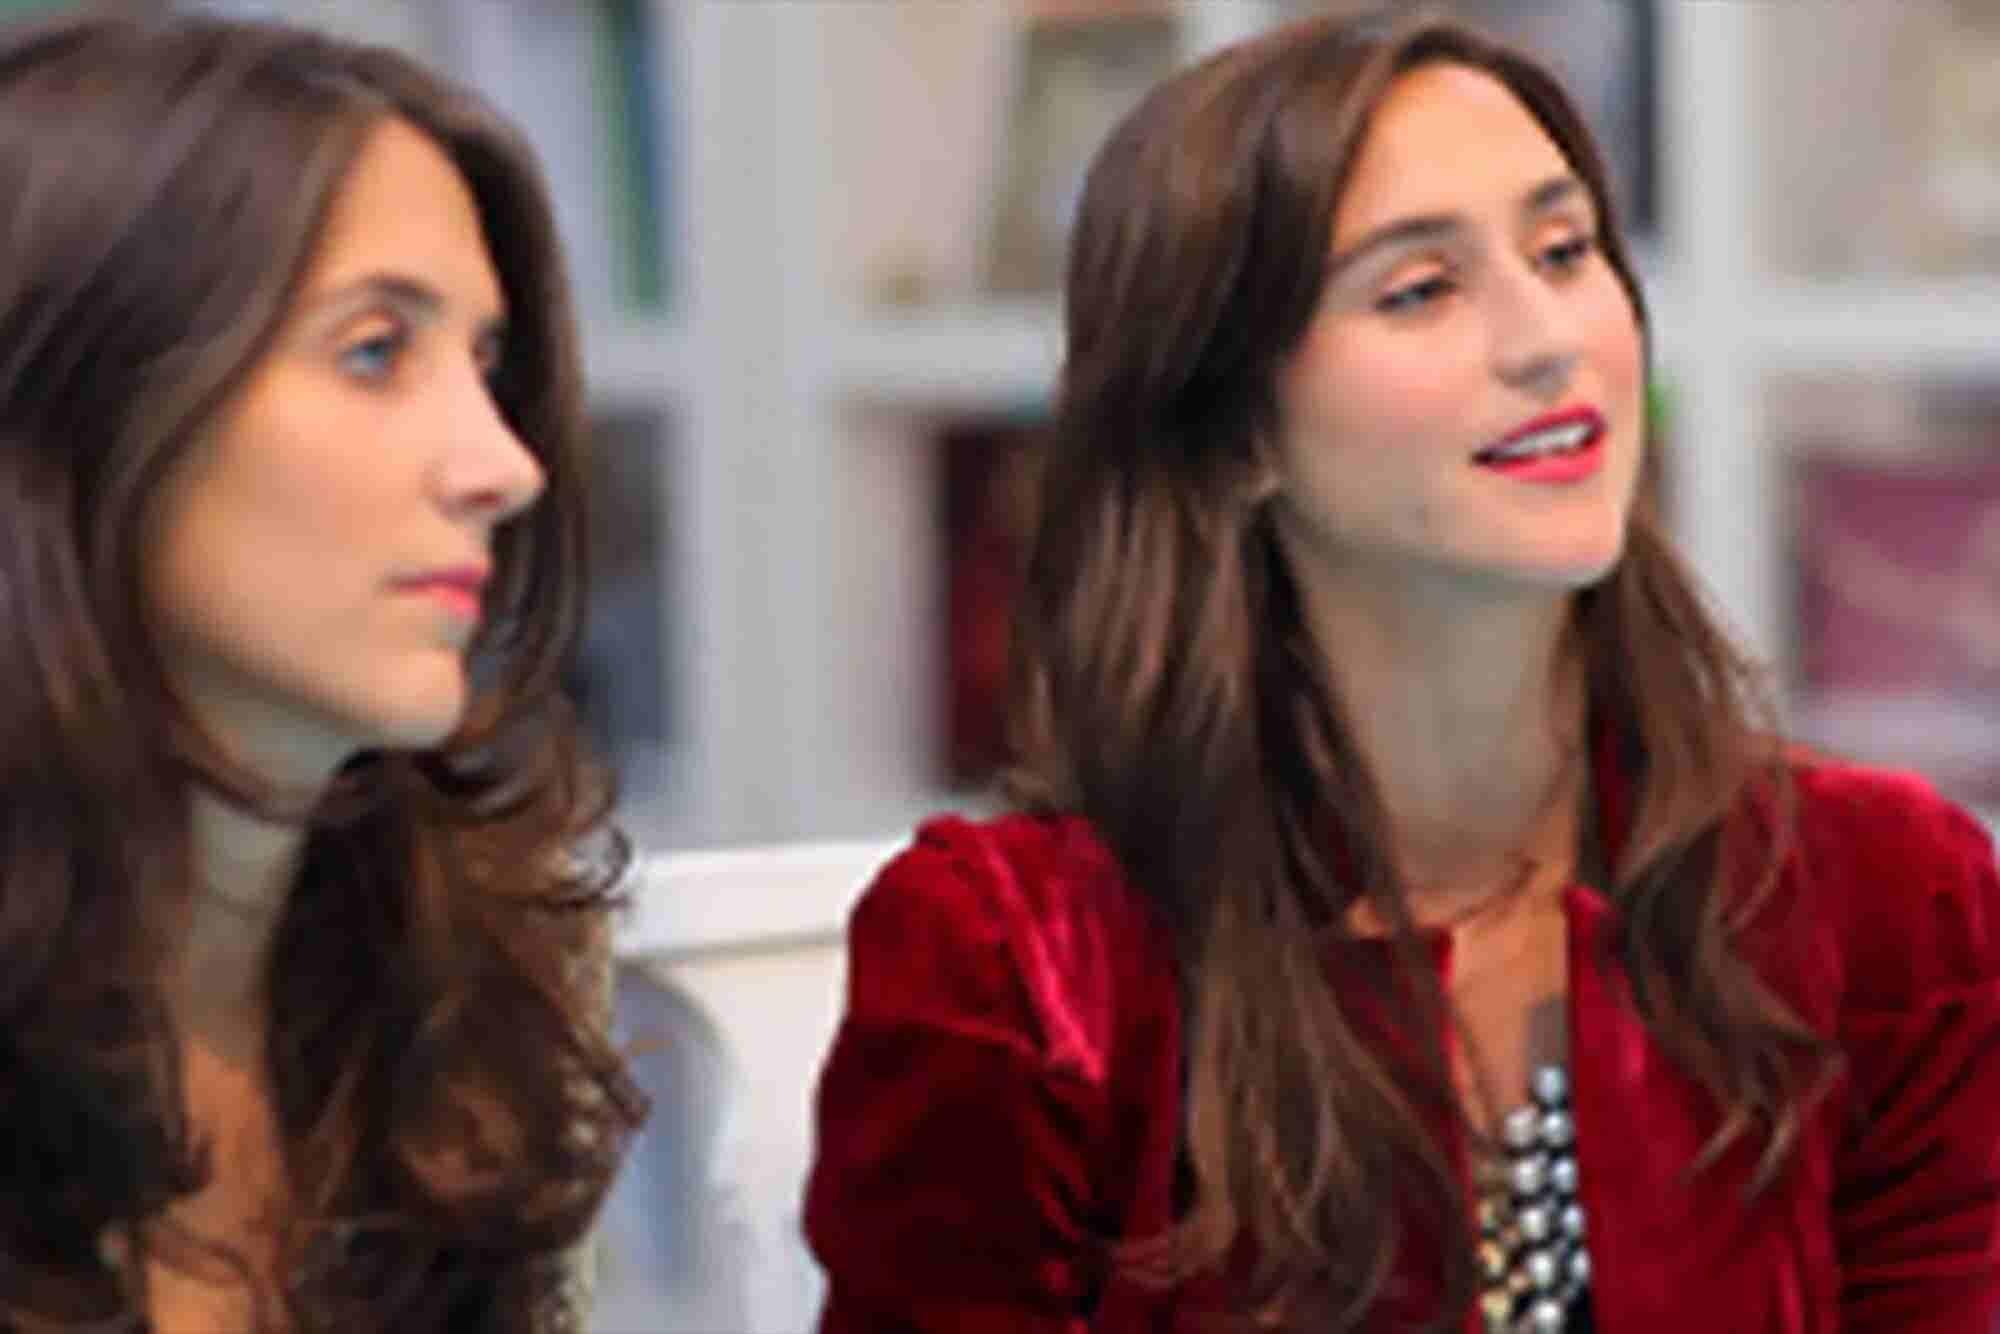 The Innovators: Dannijo's Jodie & Danielle Snyder